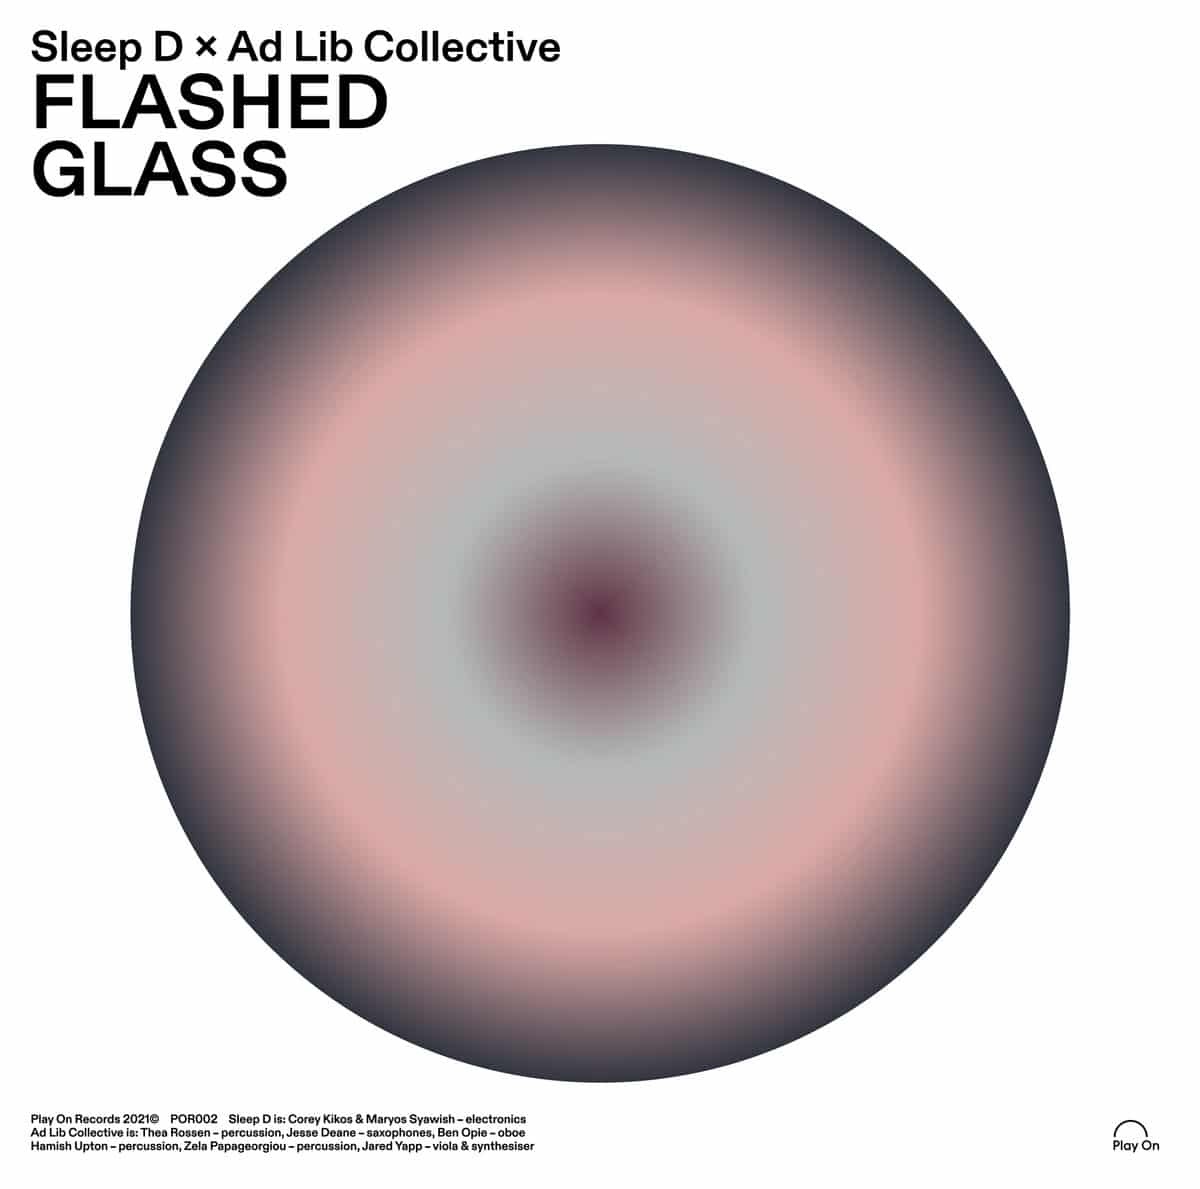 sleep d adlib collective flashed glass